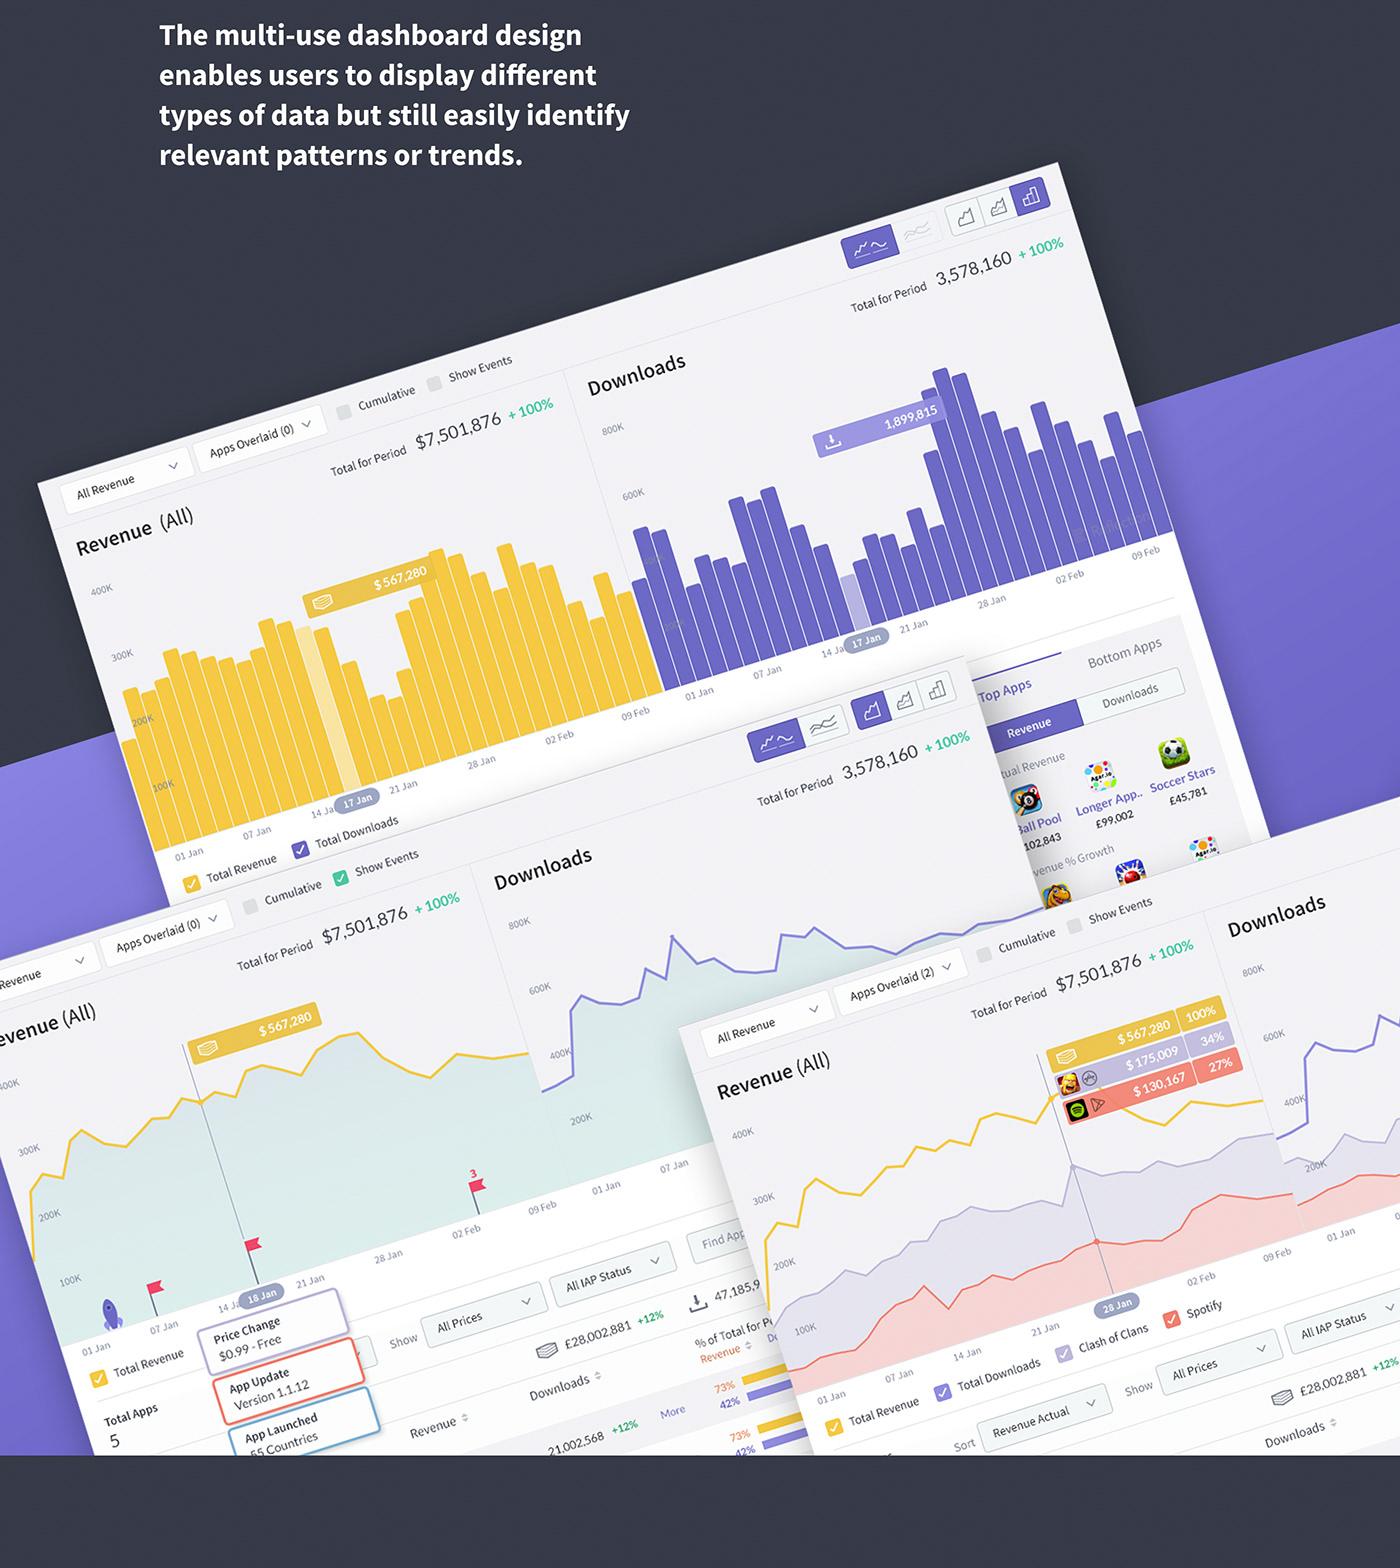 Data app revenue chart graph dataviz reflection dashboard UI ux